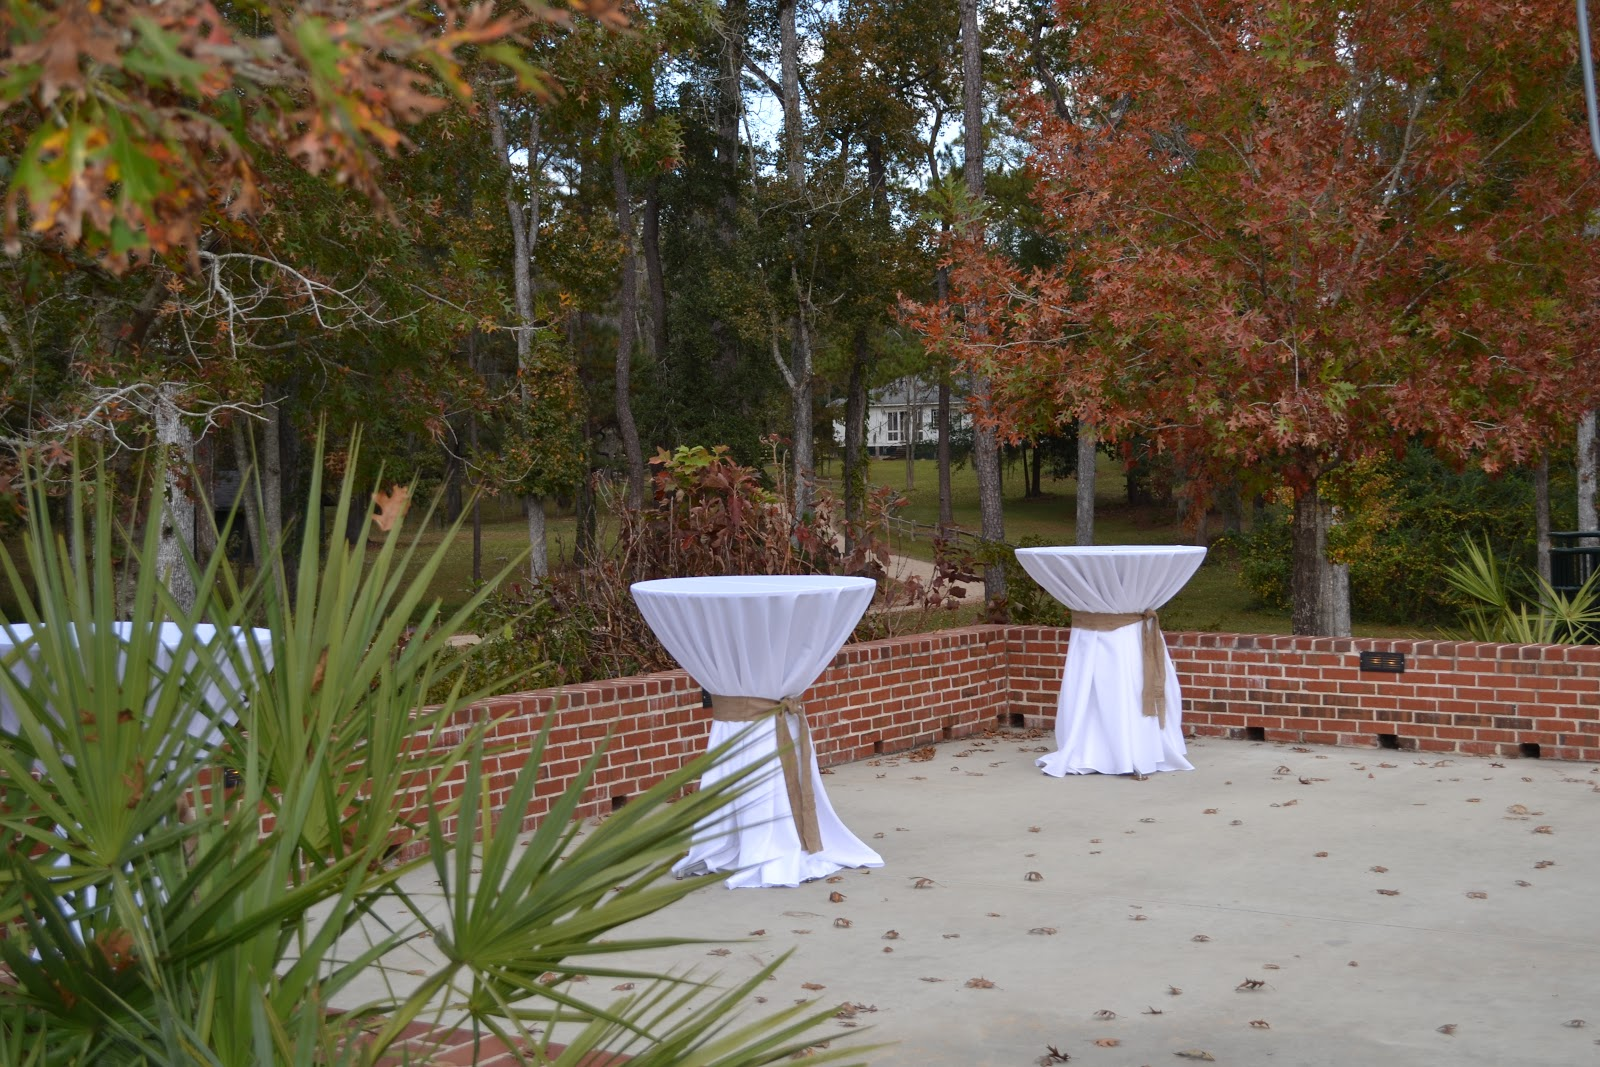 Canopy Rose Catering Company 850-539-7750: November 2012